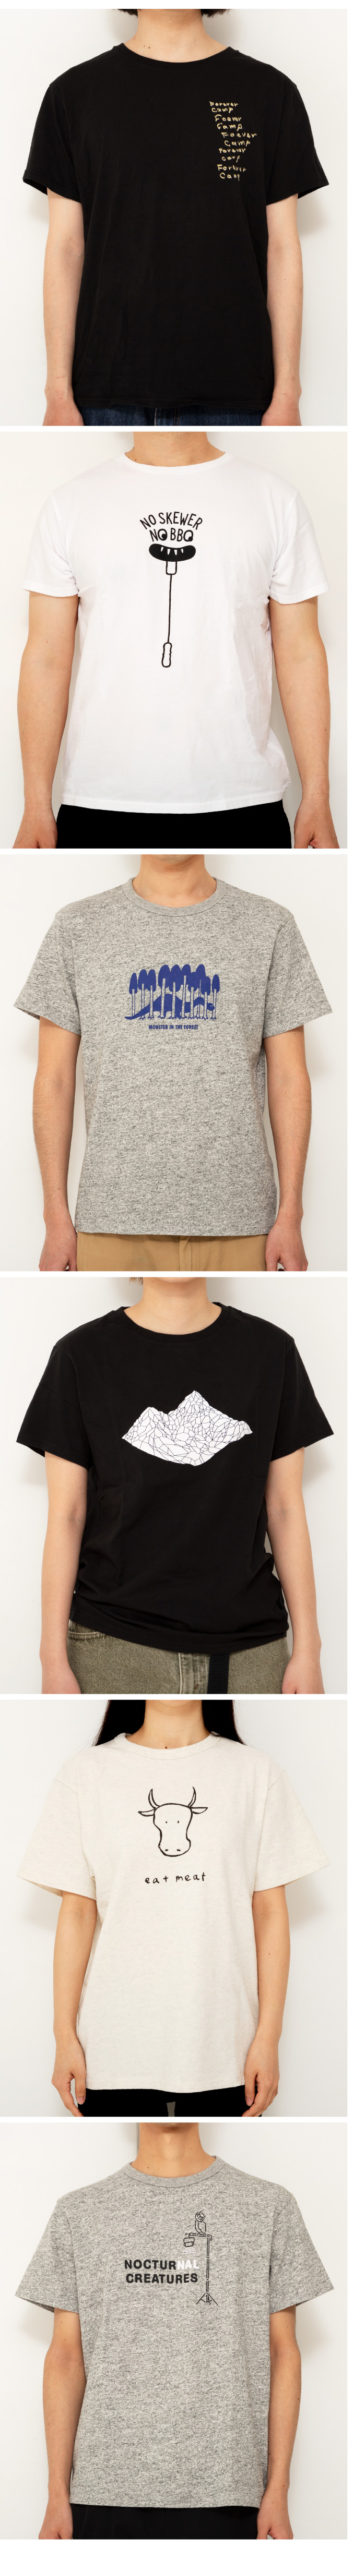 LOGOS T-shirts Design